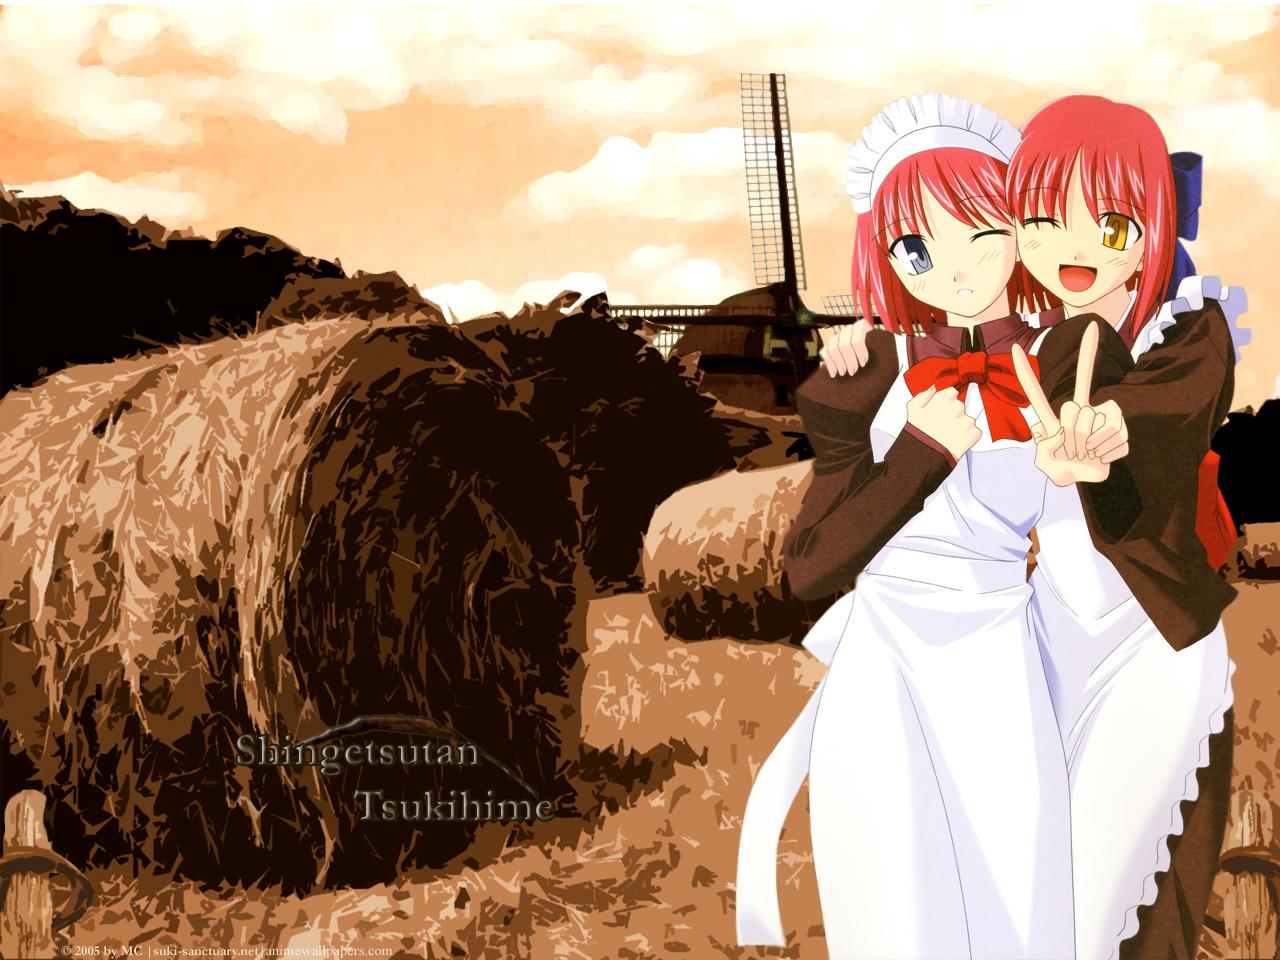 Tsukihime - Lunar Legend Anime Wallpaper # 5